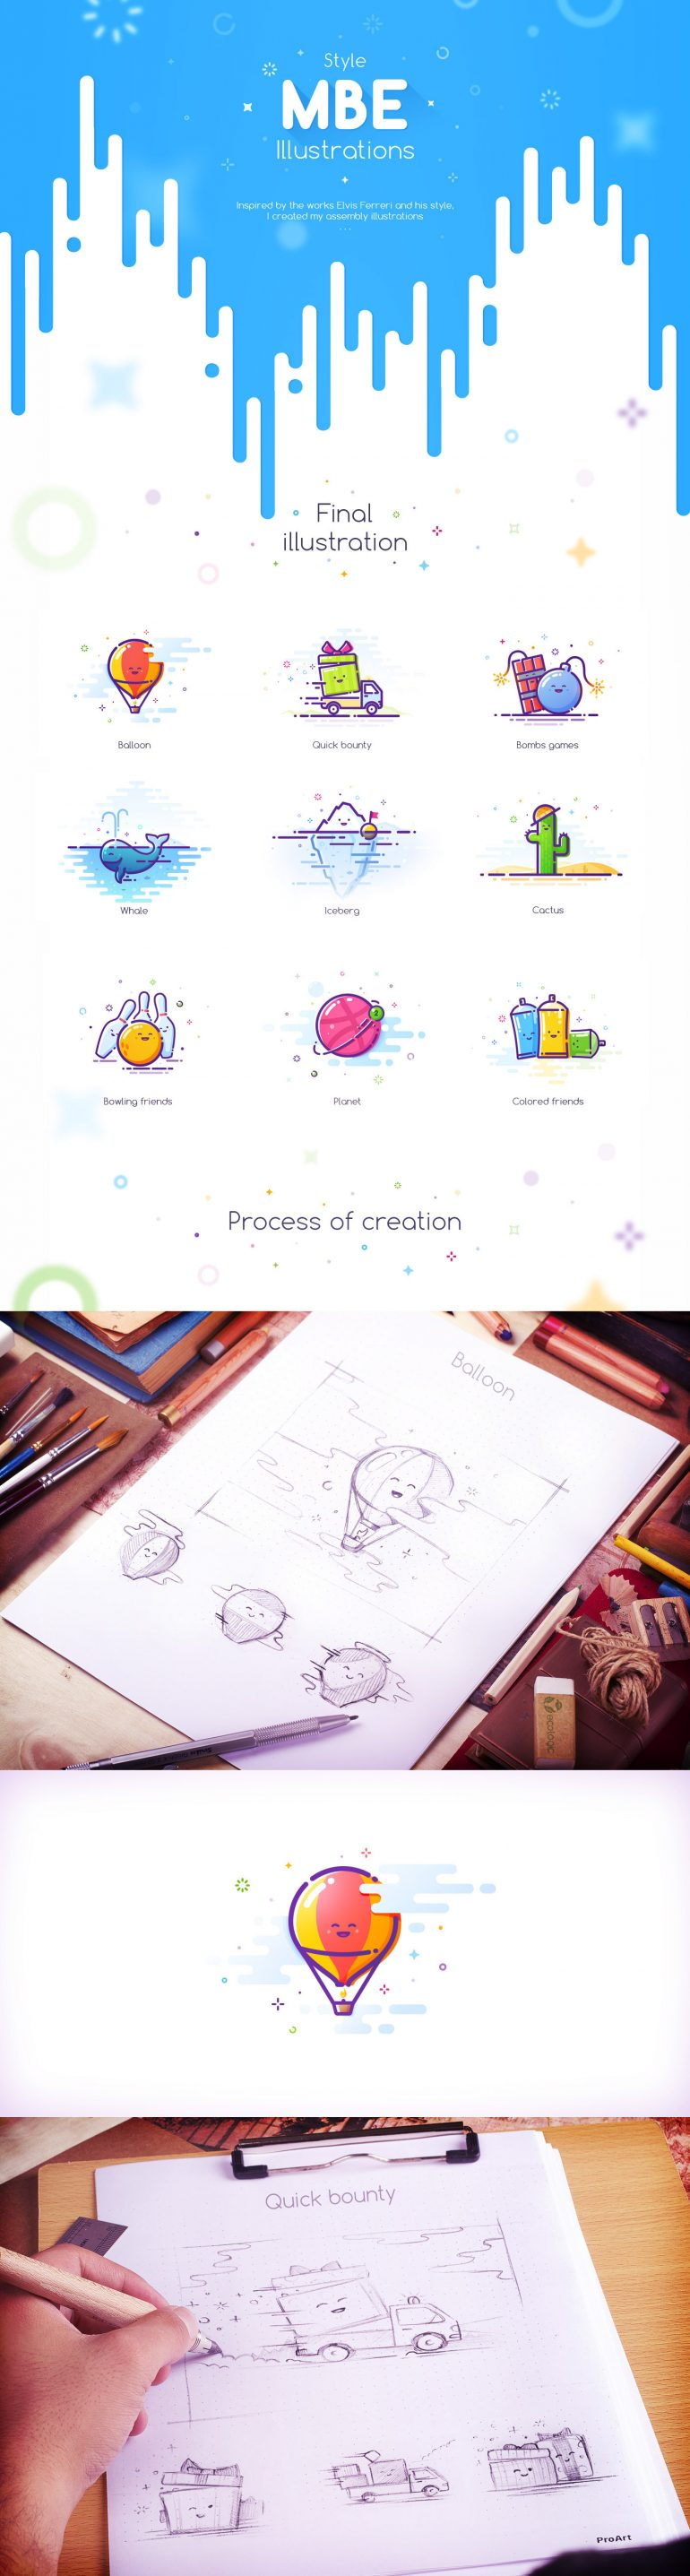 MBE Style Illustration process on Inspirationde